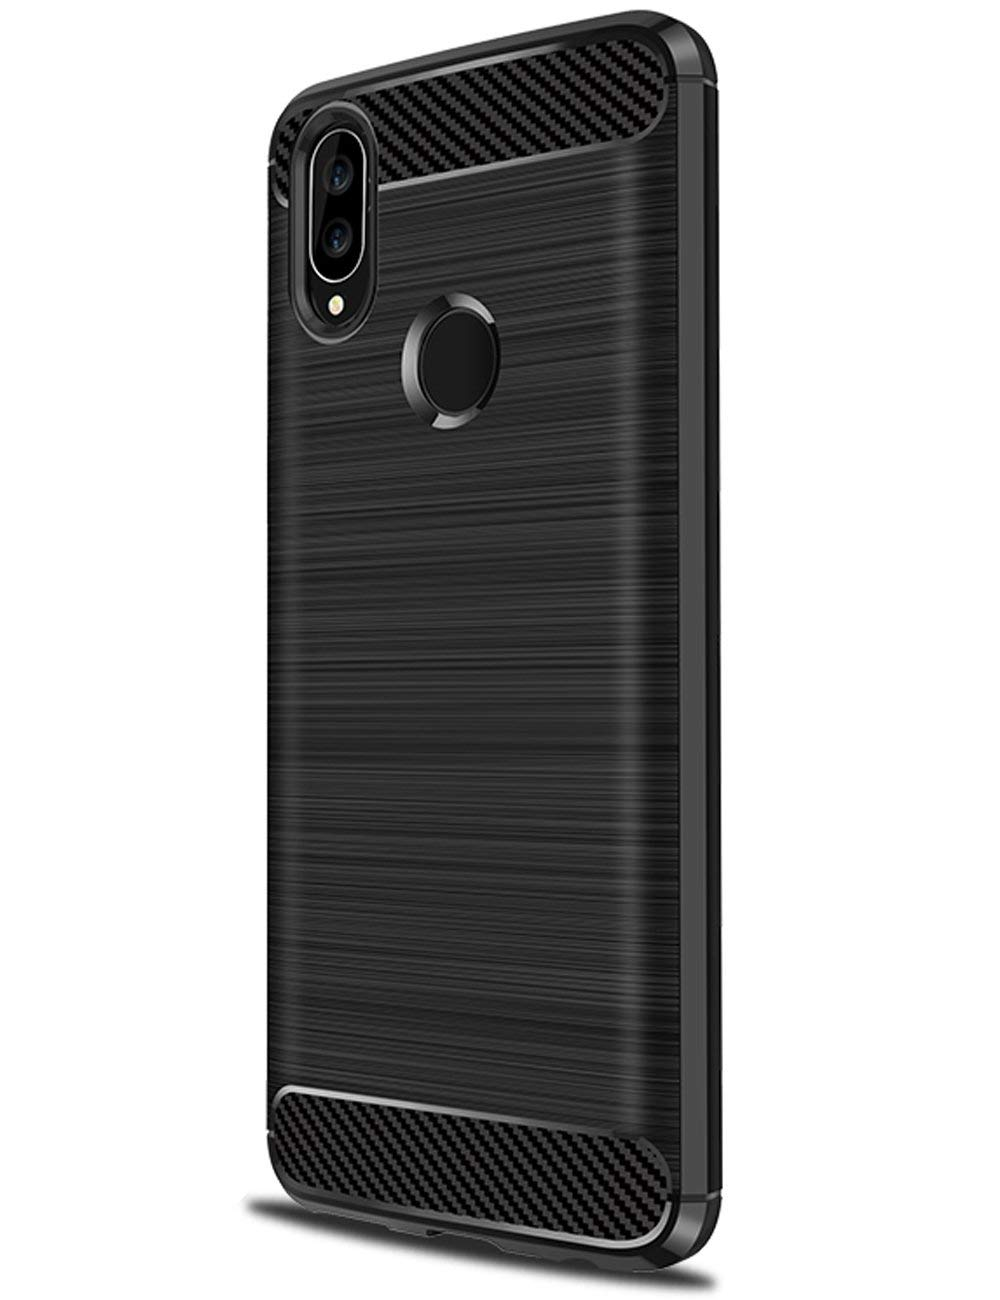 Coque-Etui-Housse-Silicone-brossee-Fibre-de-carbone-Noir-Protection-Huawei miniature 8